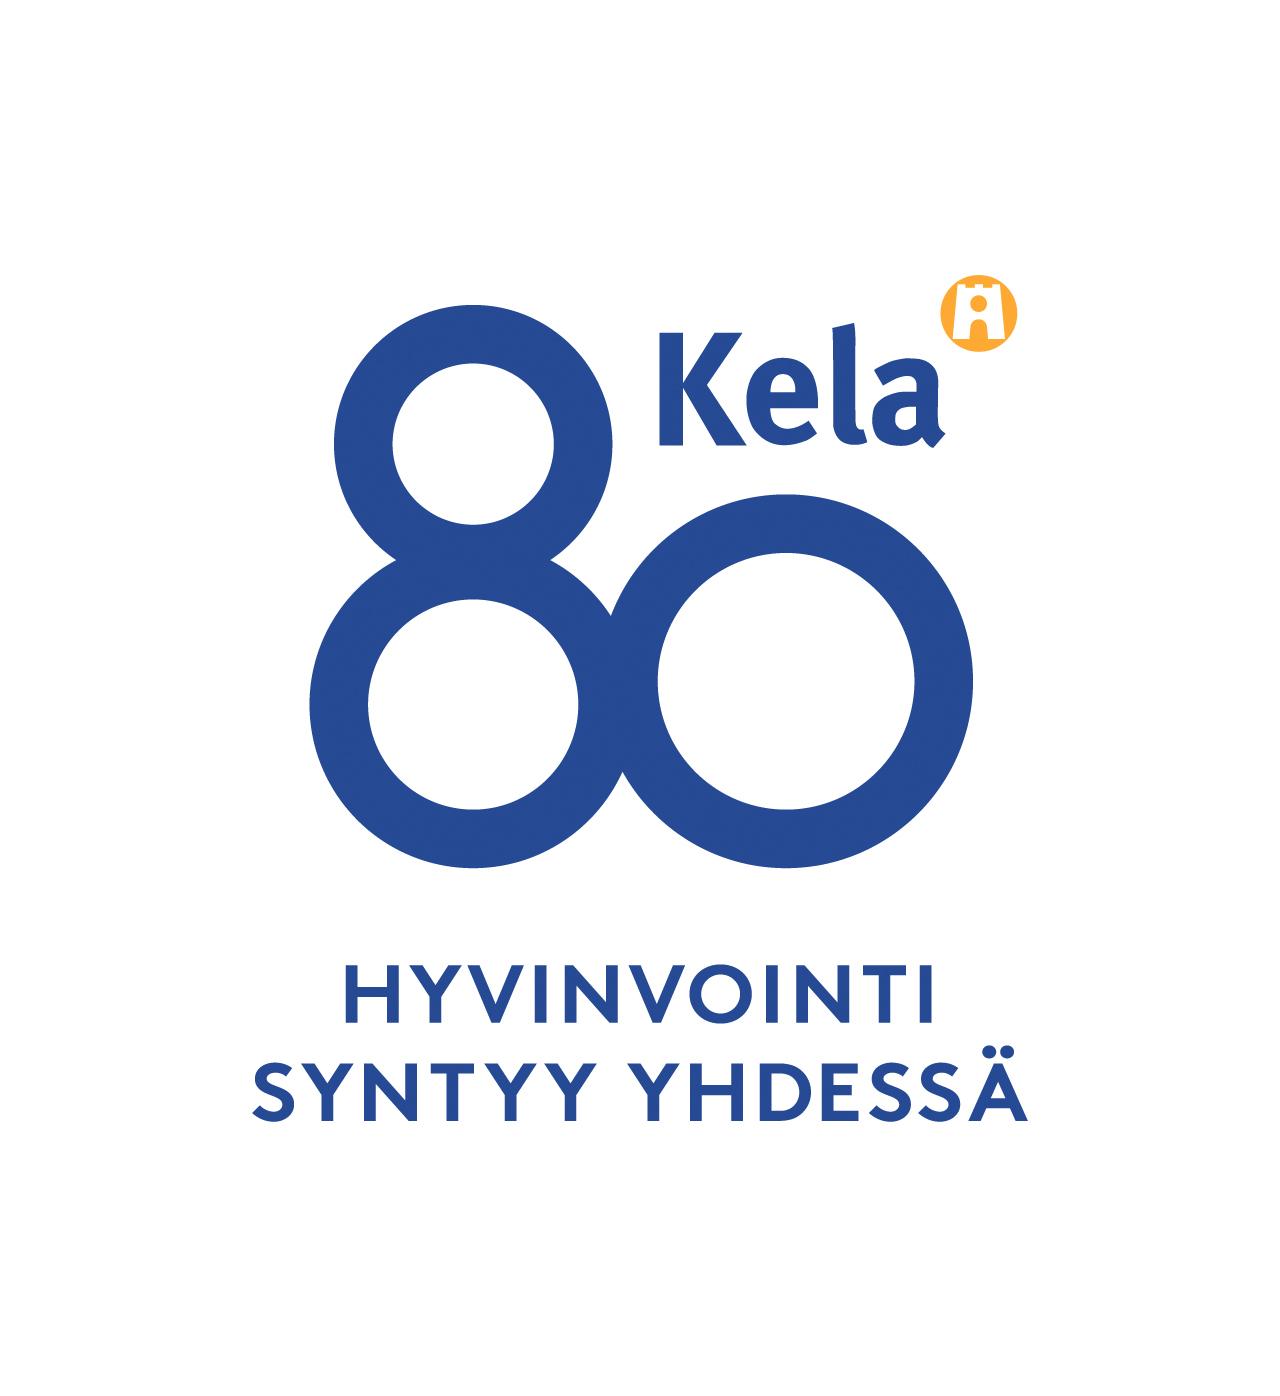 kela_80_logo